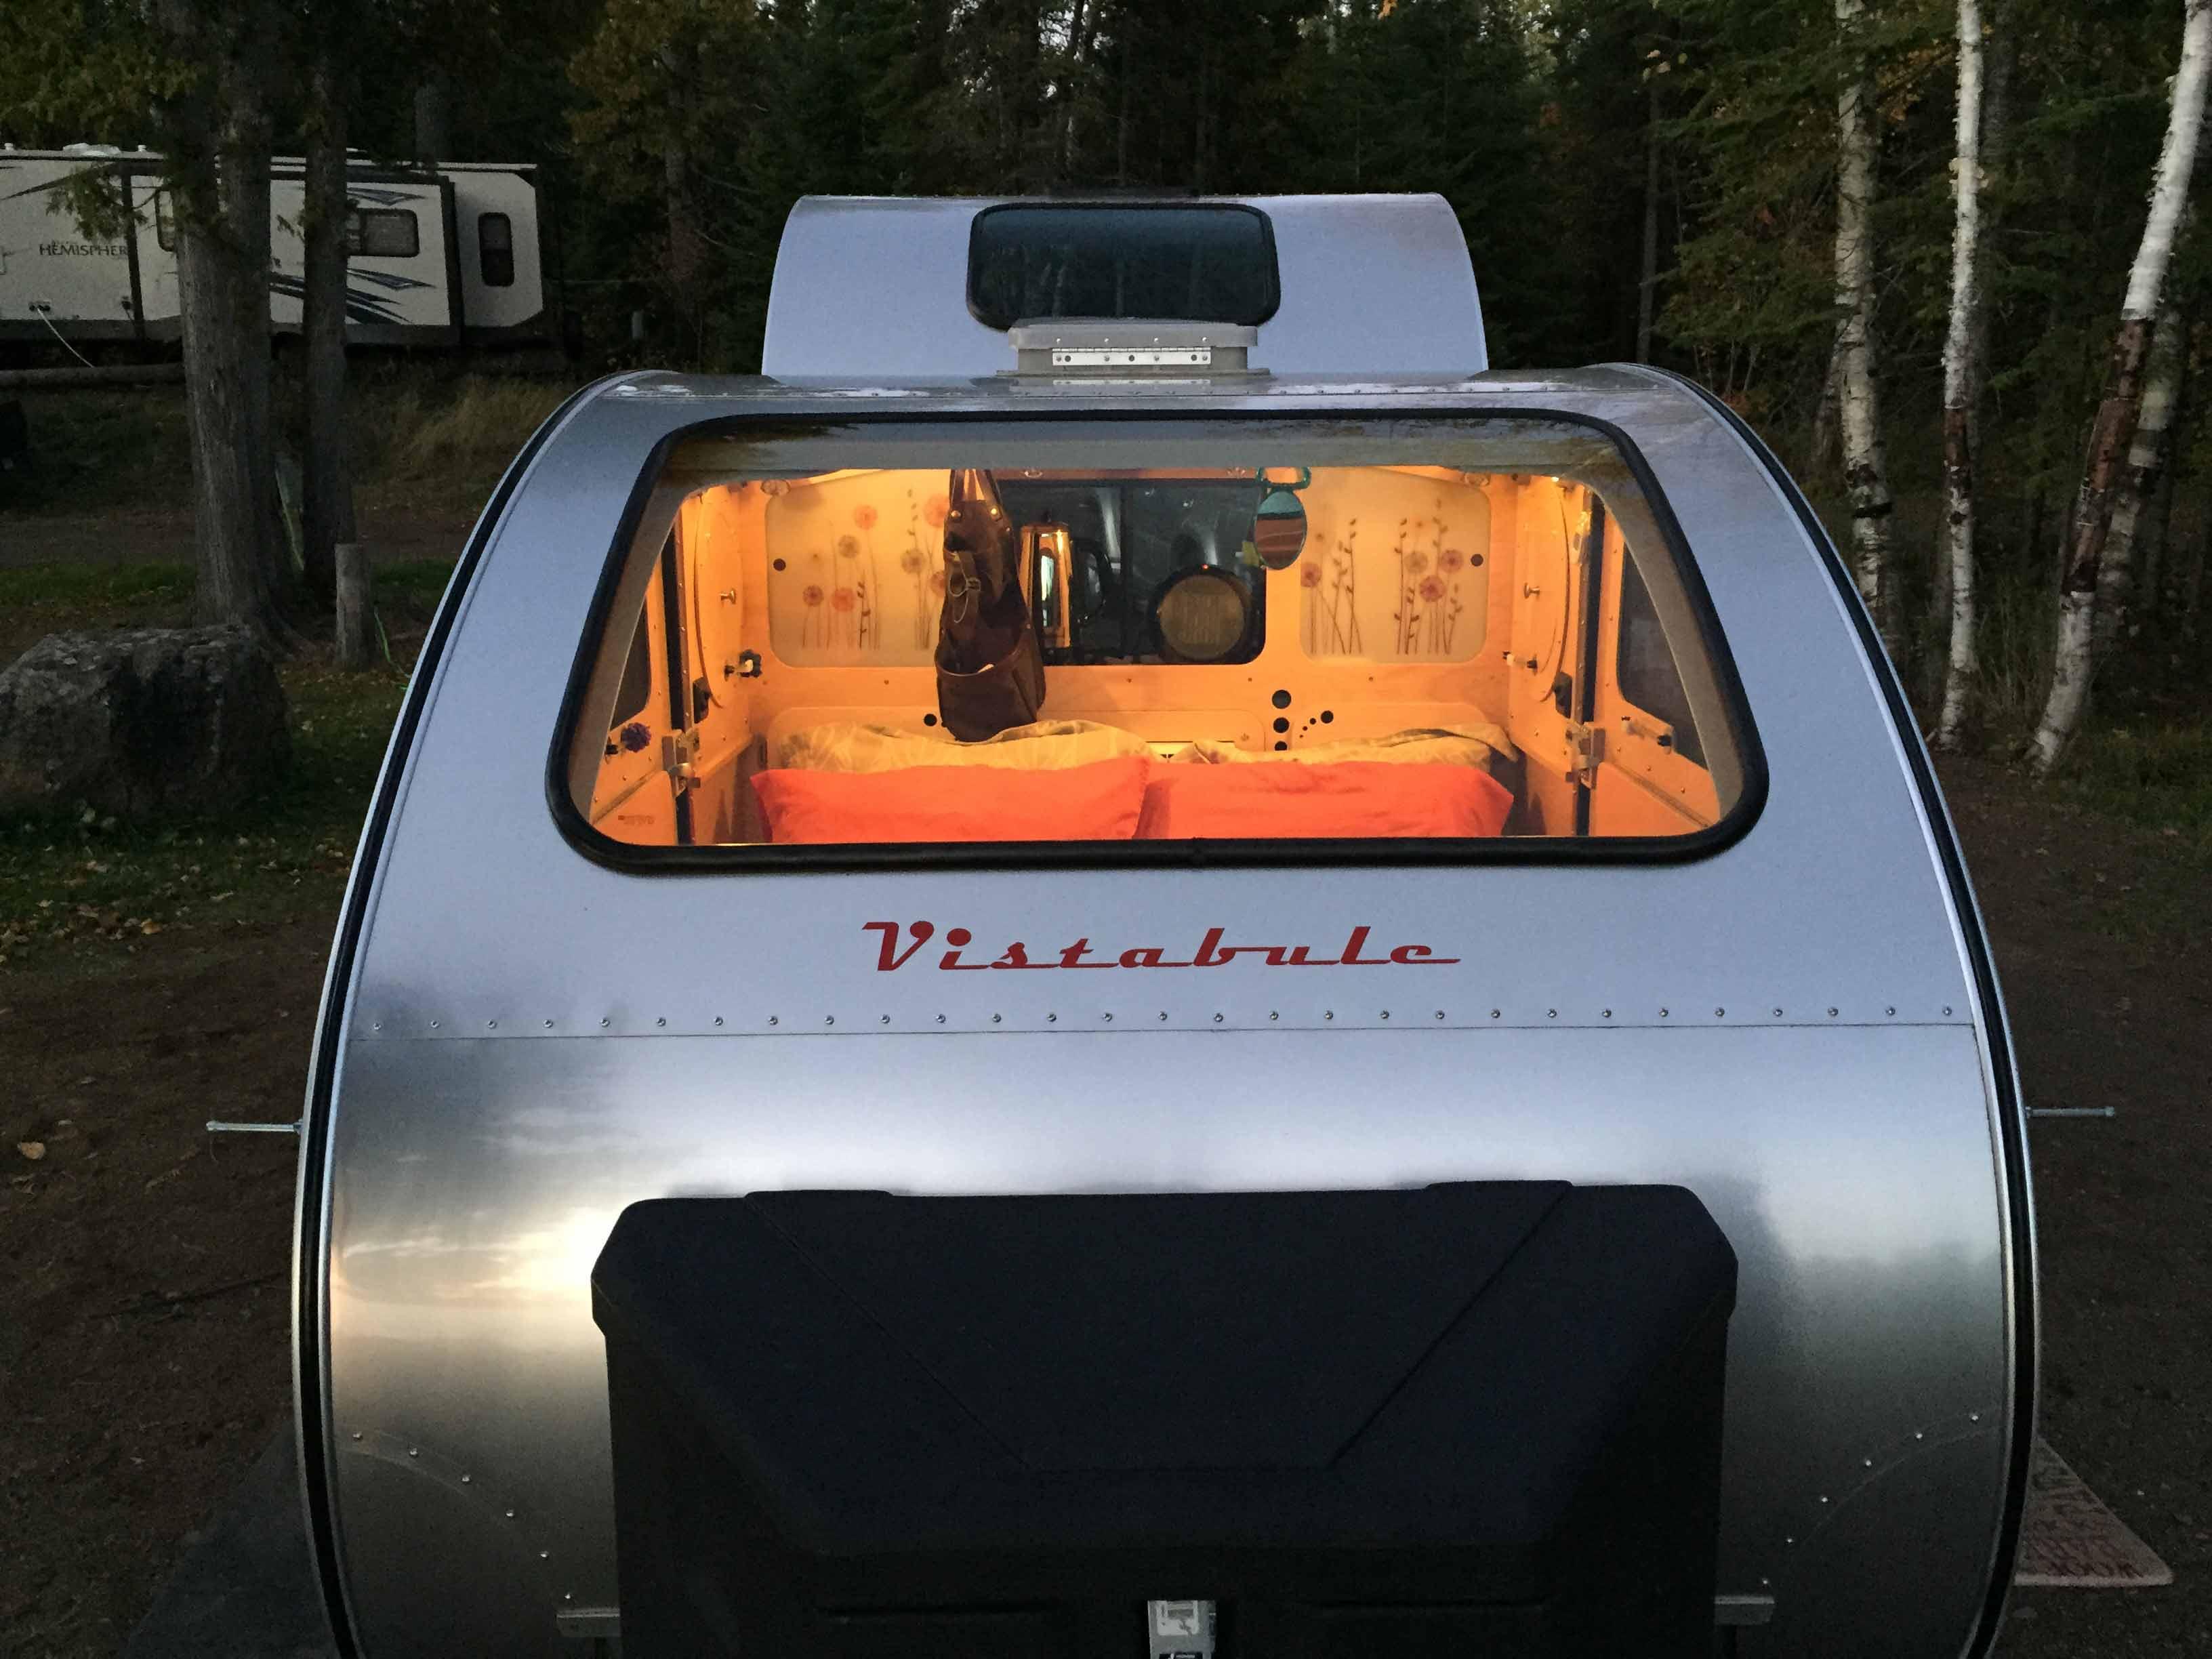 Tiny teardrop trailer has huge windows for stargazing